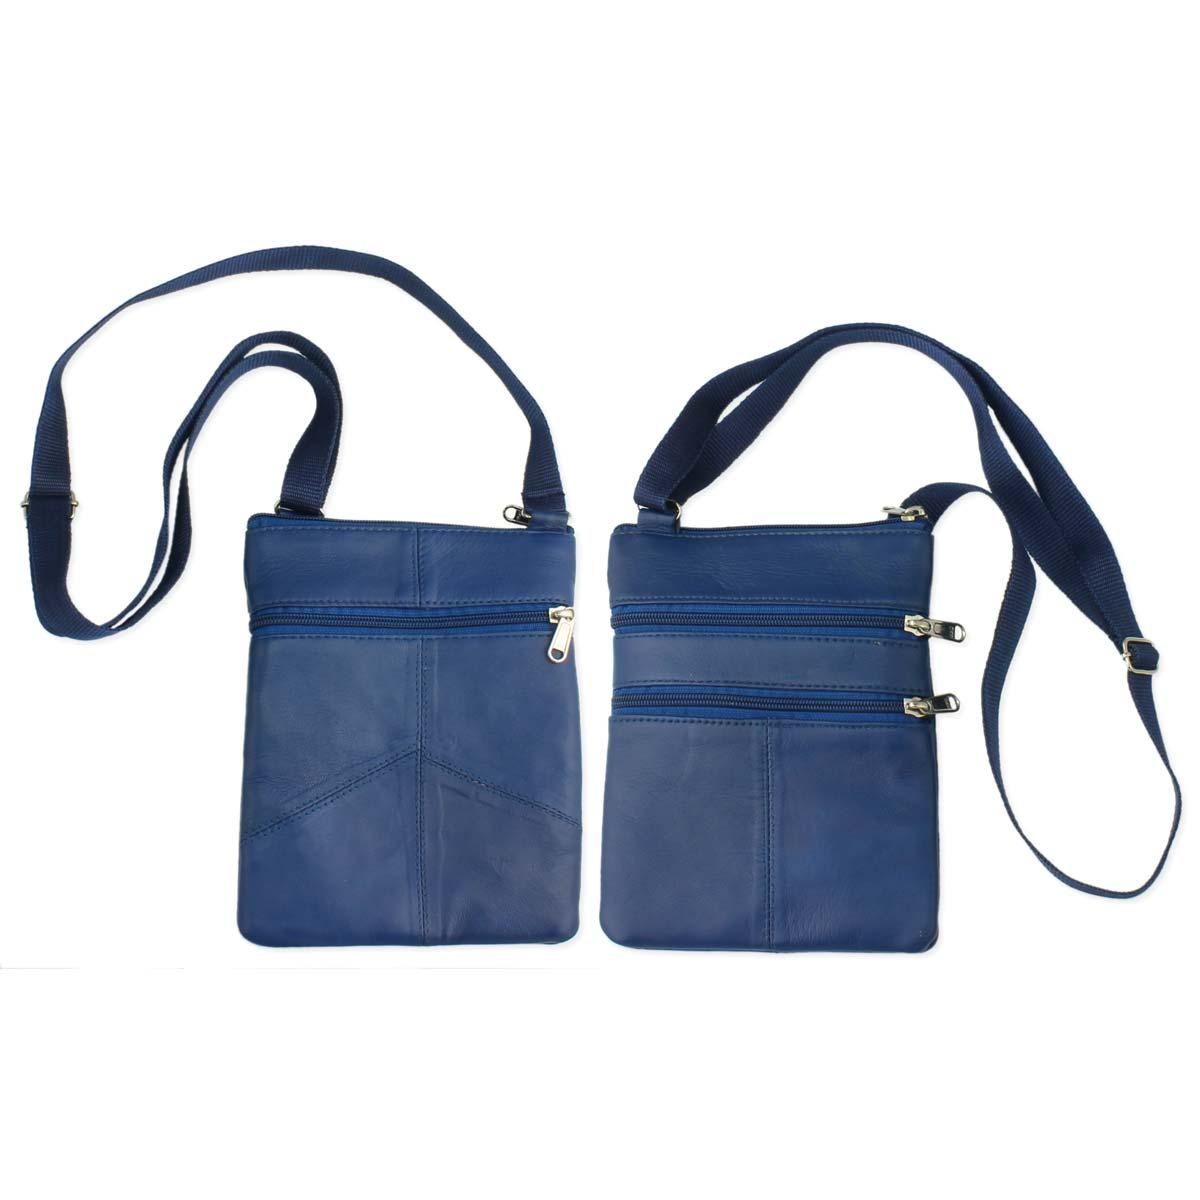 Blue Leather Passport Cross Body Bag